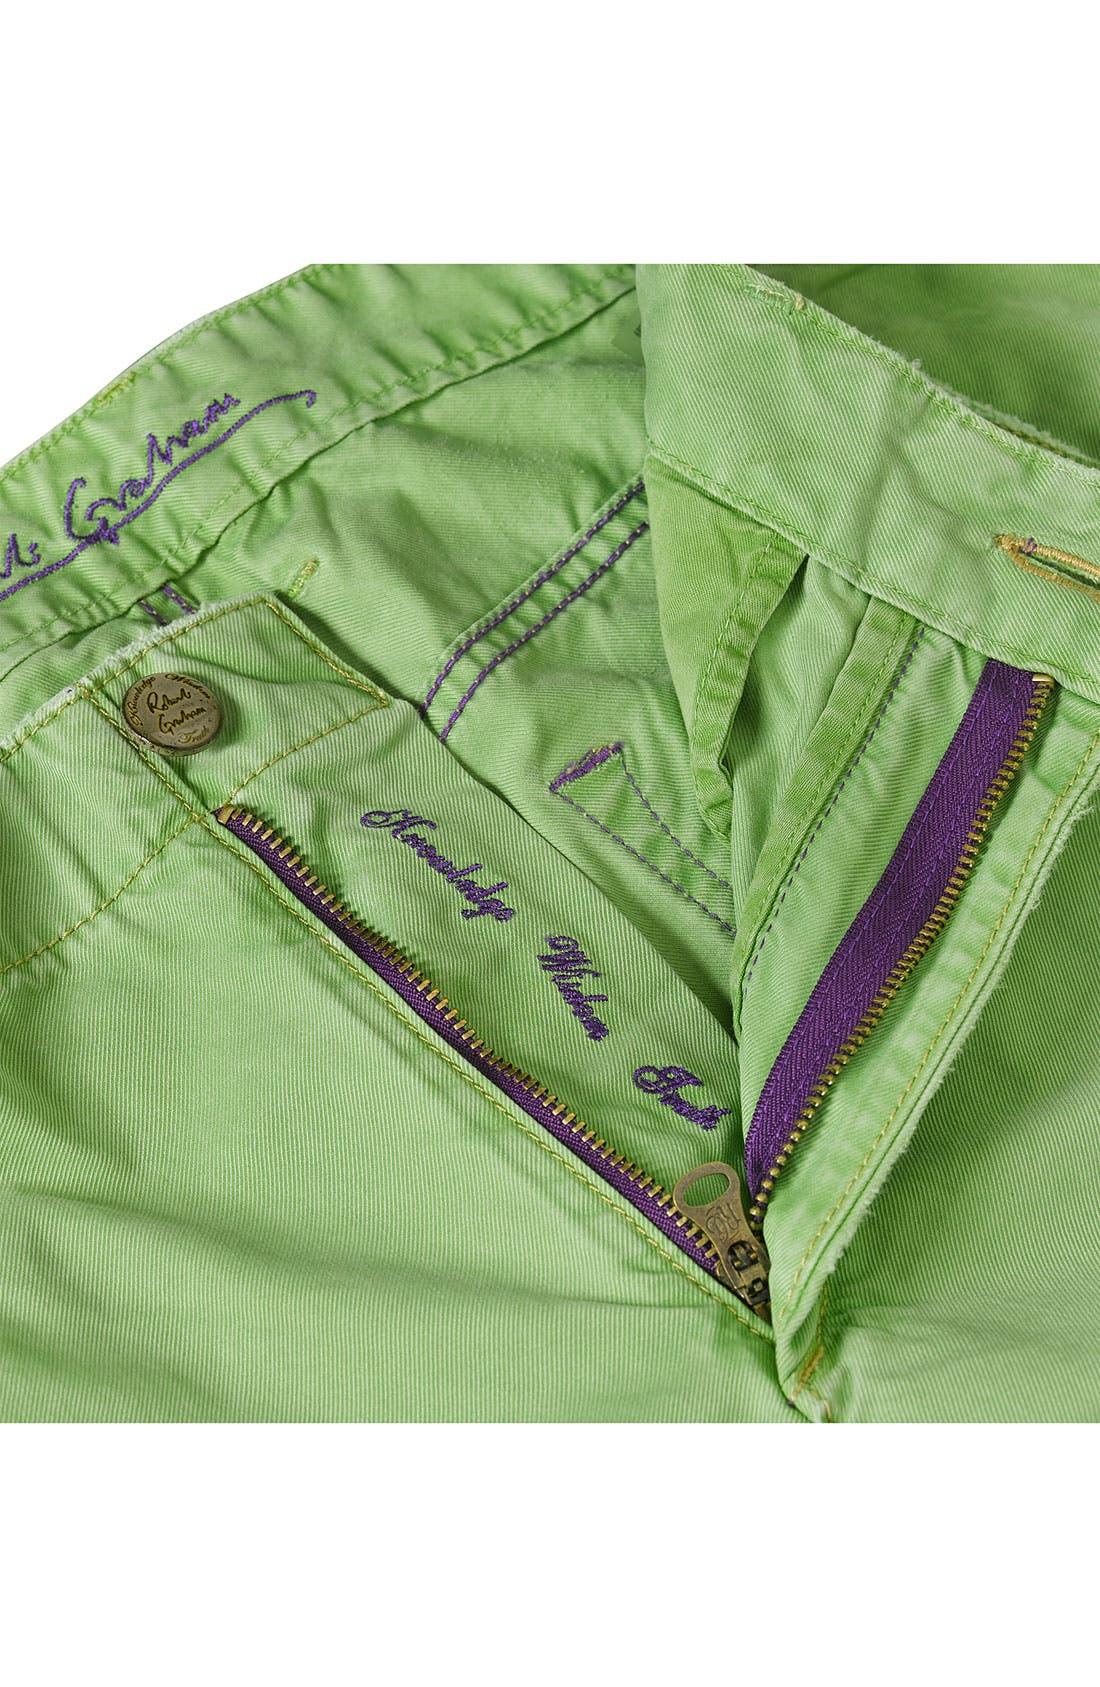 Alternate Image 4  - Robert Graham Jeans 'Yates' Classic Fit Pants